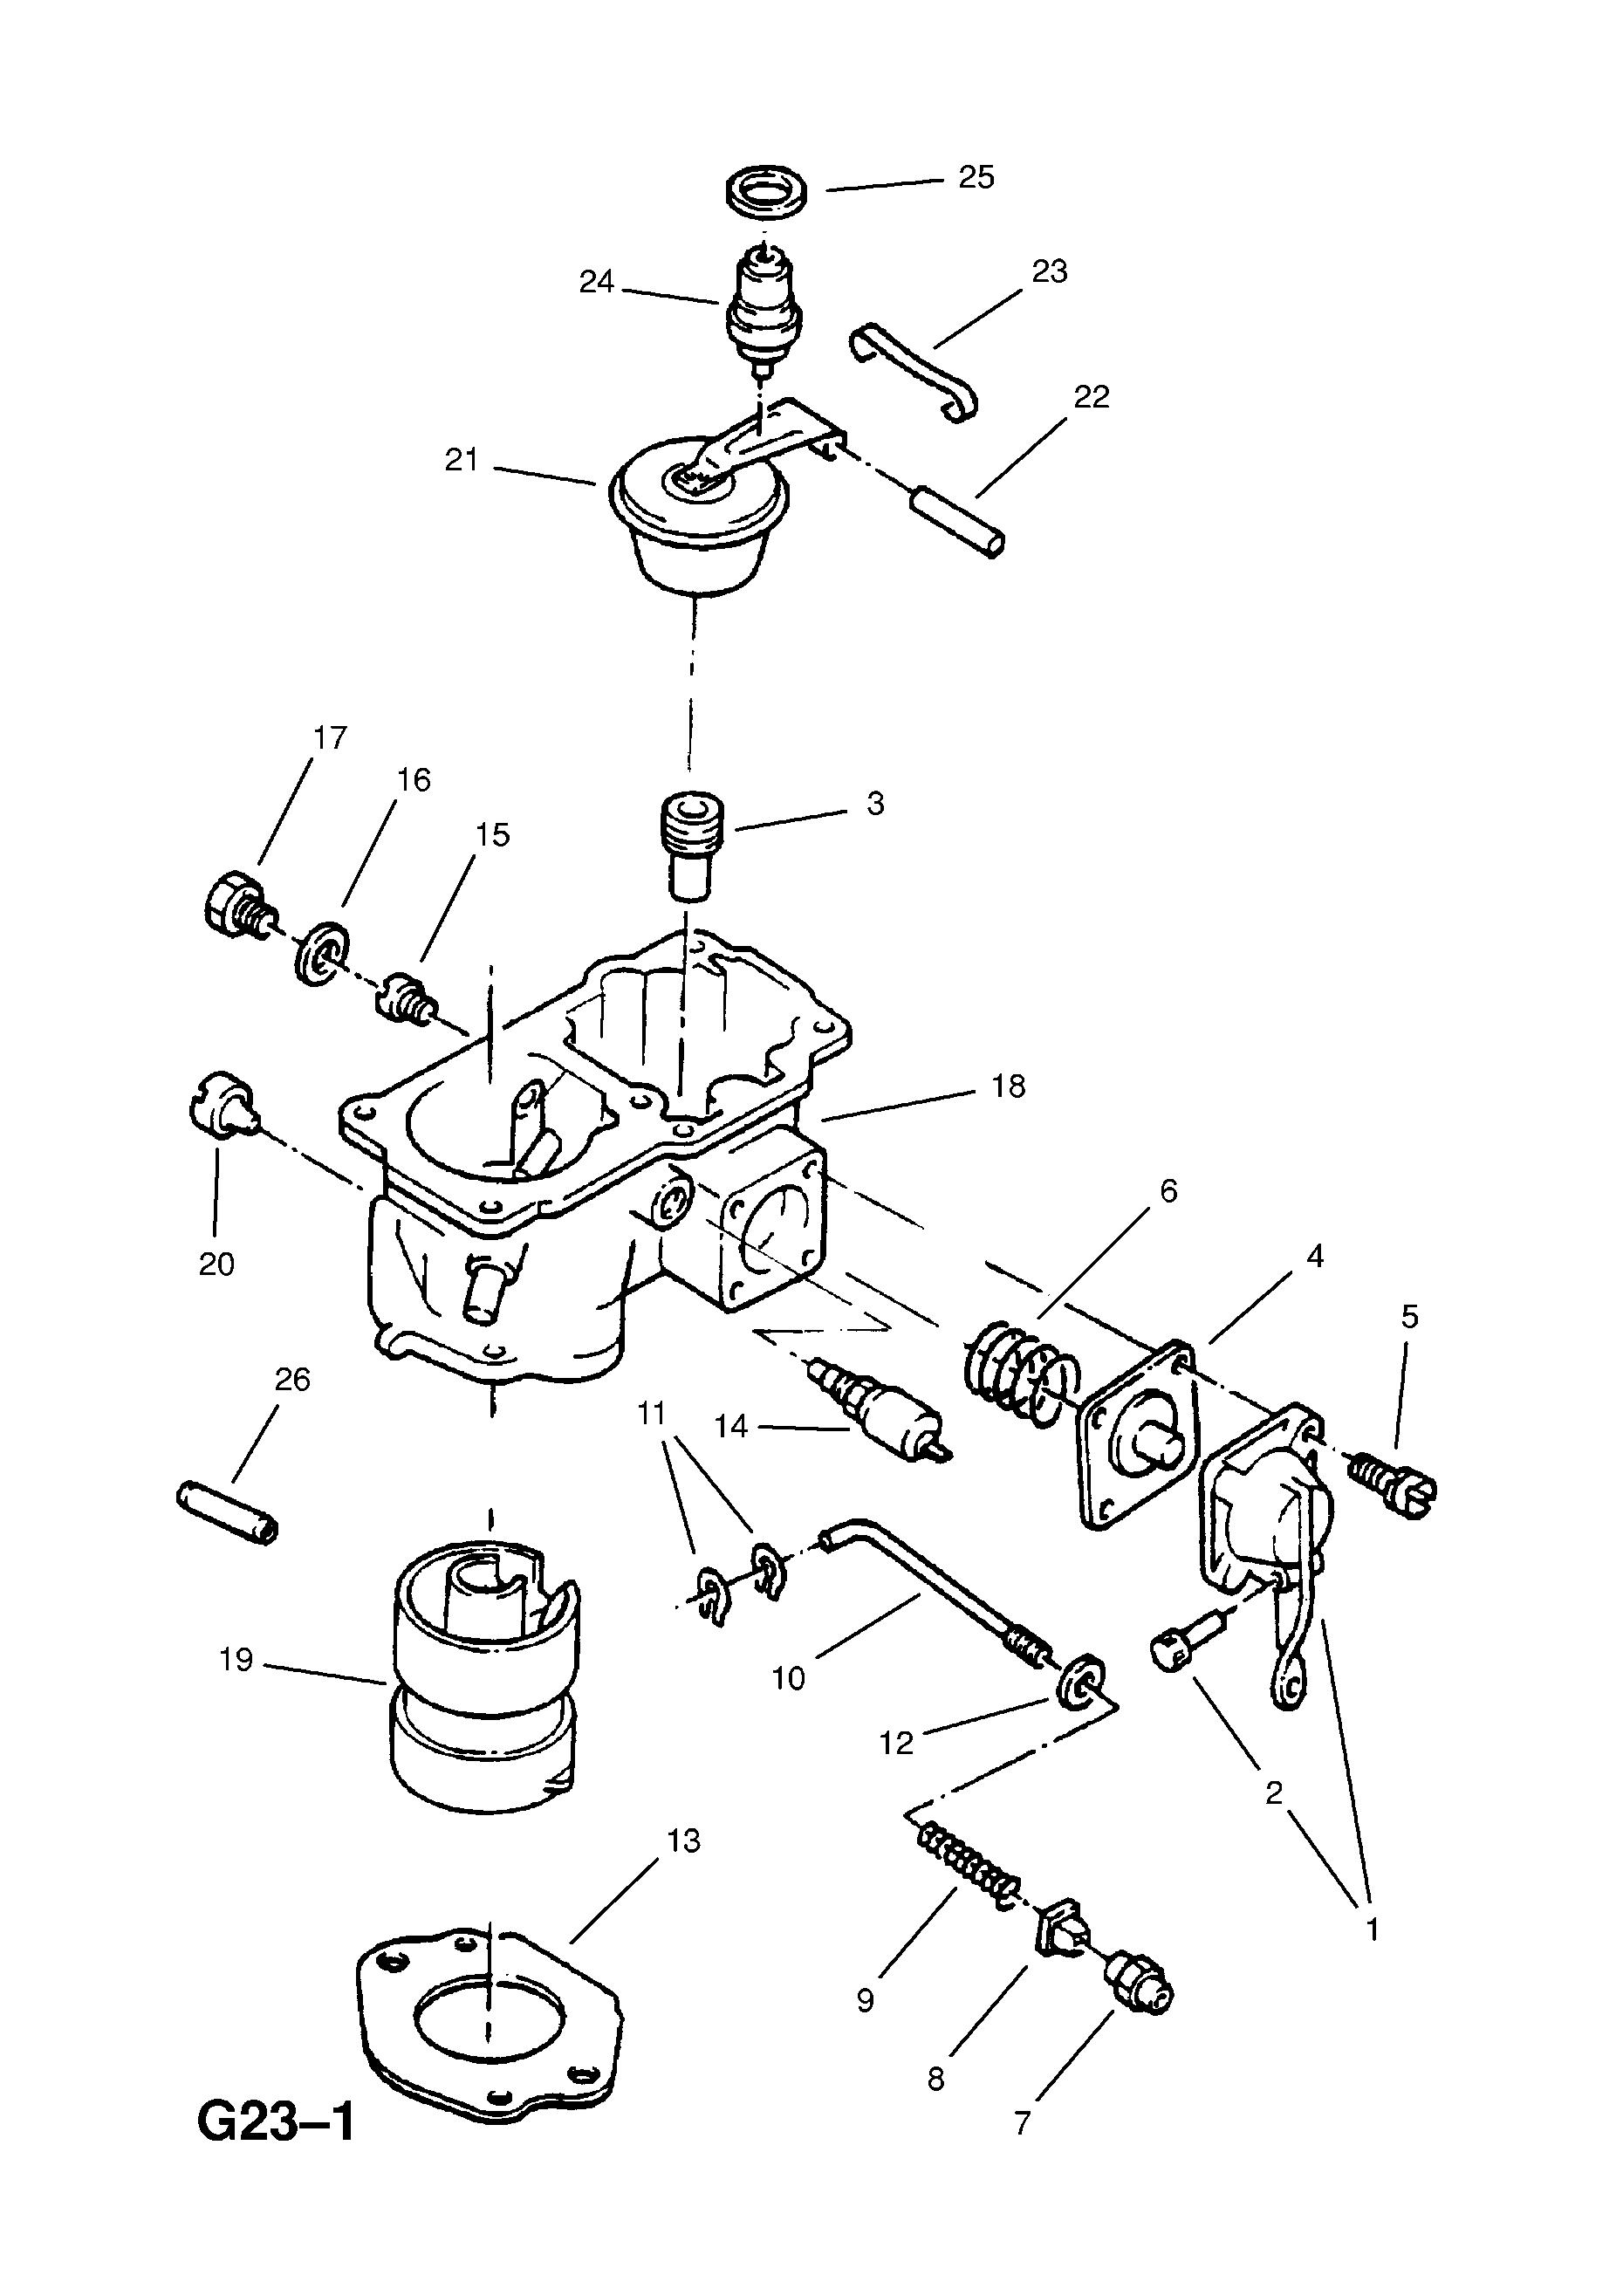 lx9 engine diagram kqc n england joinery uk Nissan 350Z Fuse Box Diagram lx9 engine diagram 4 2 petraoberheit de u2022 rh 4 2 petraoberheit de gm family engine ii gm engine family